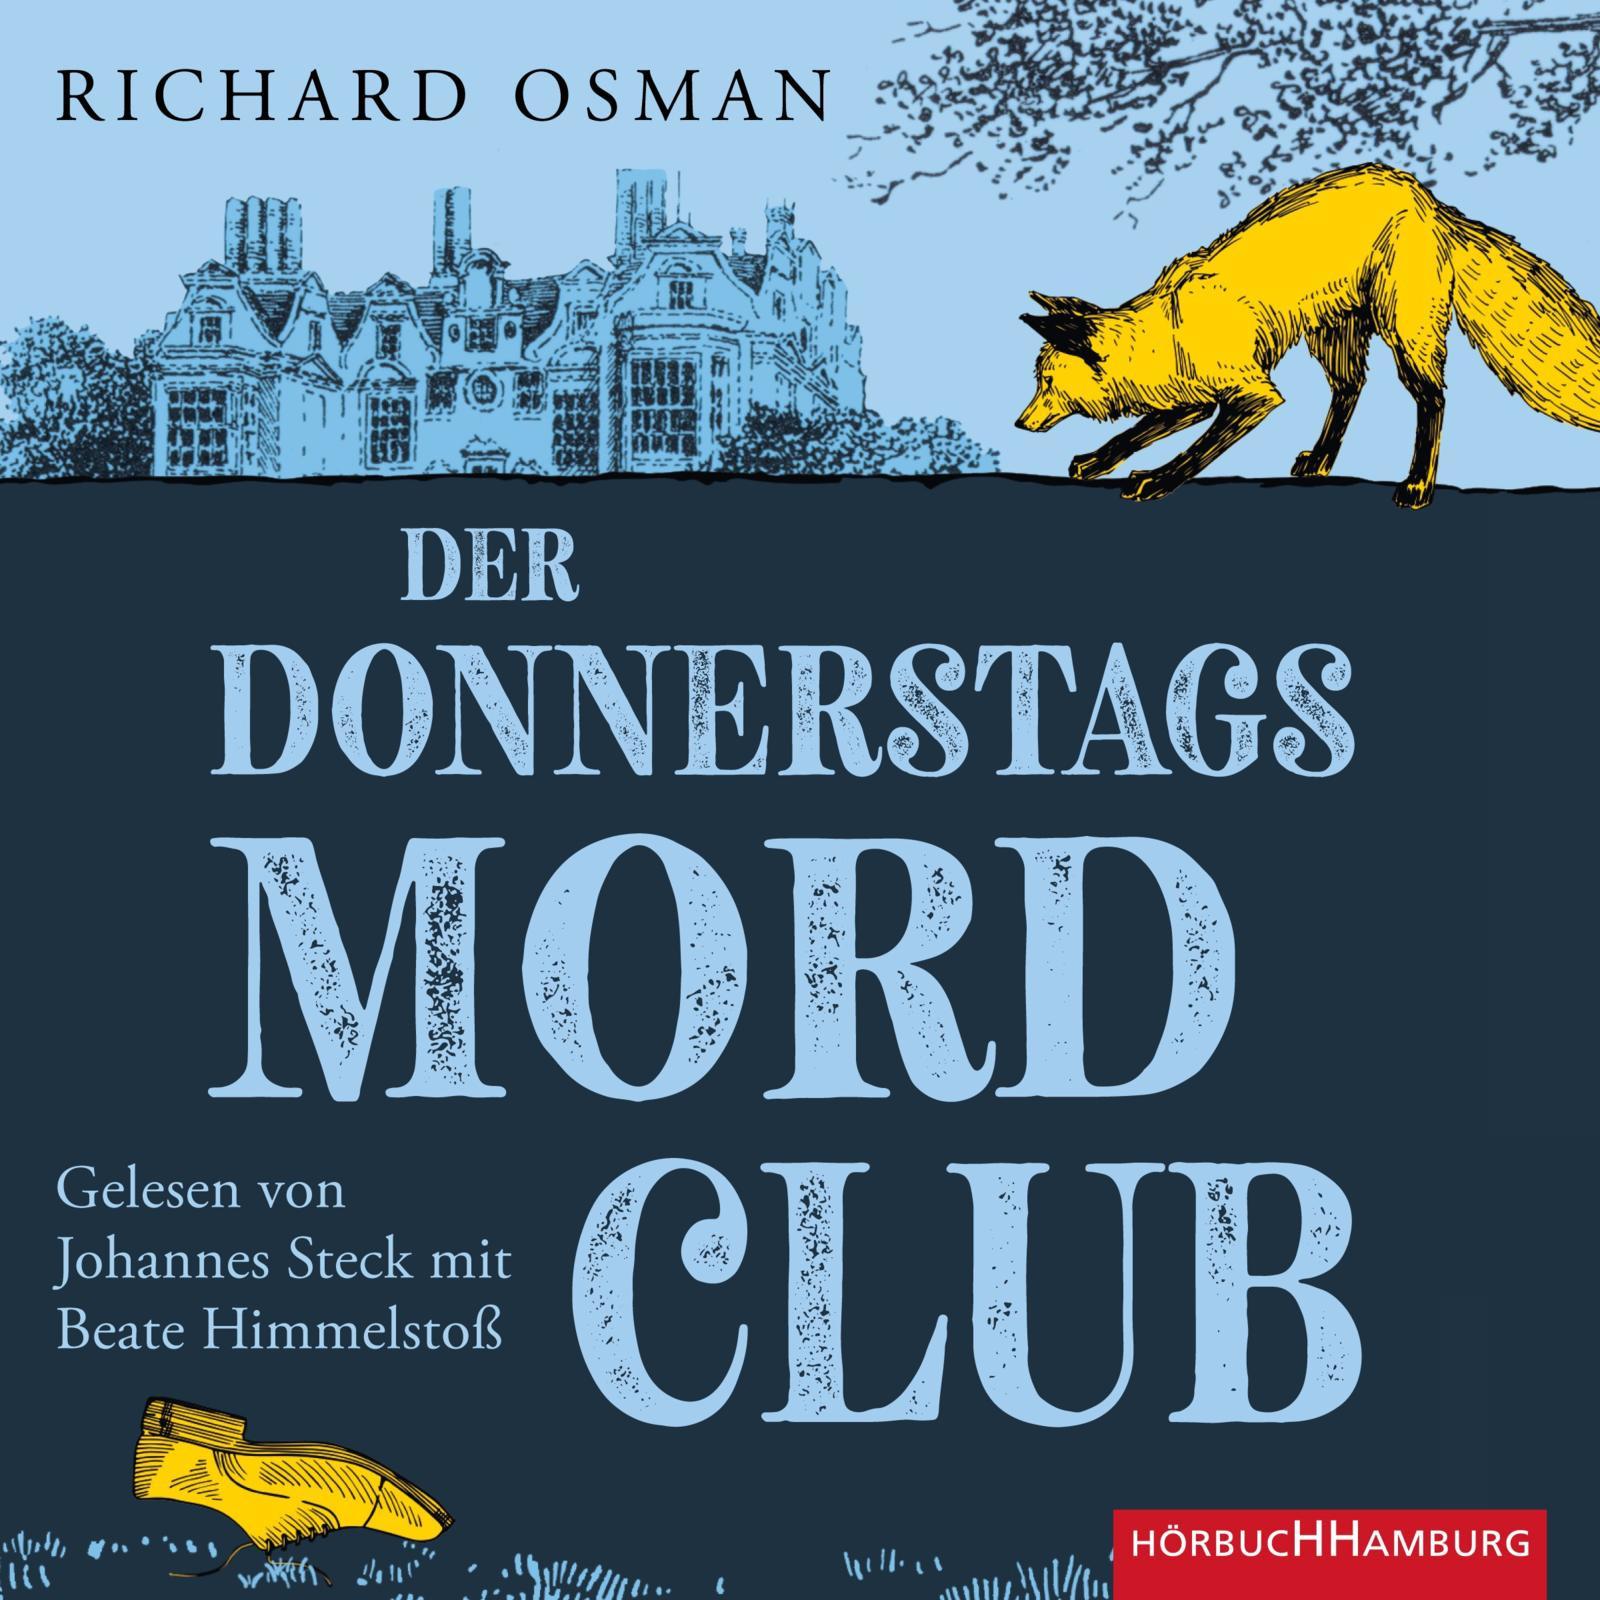 Richard Osman - Der Montagsmordclub